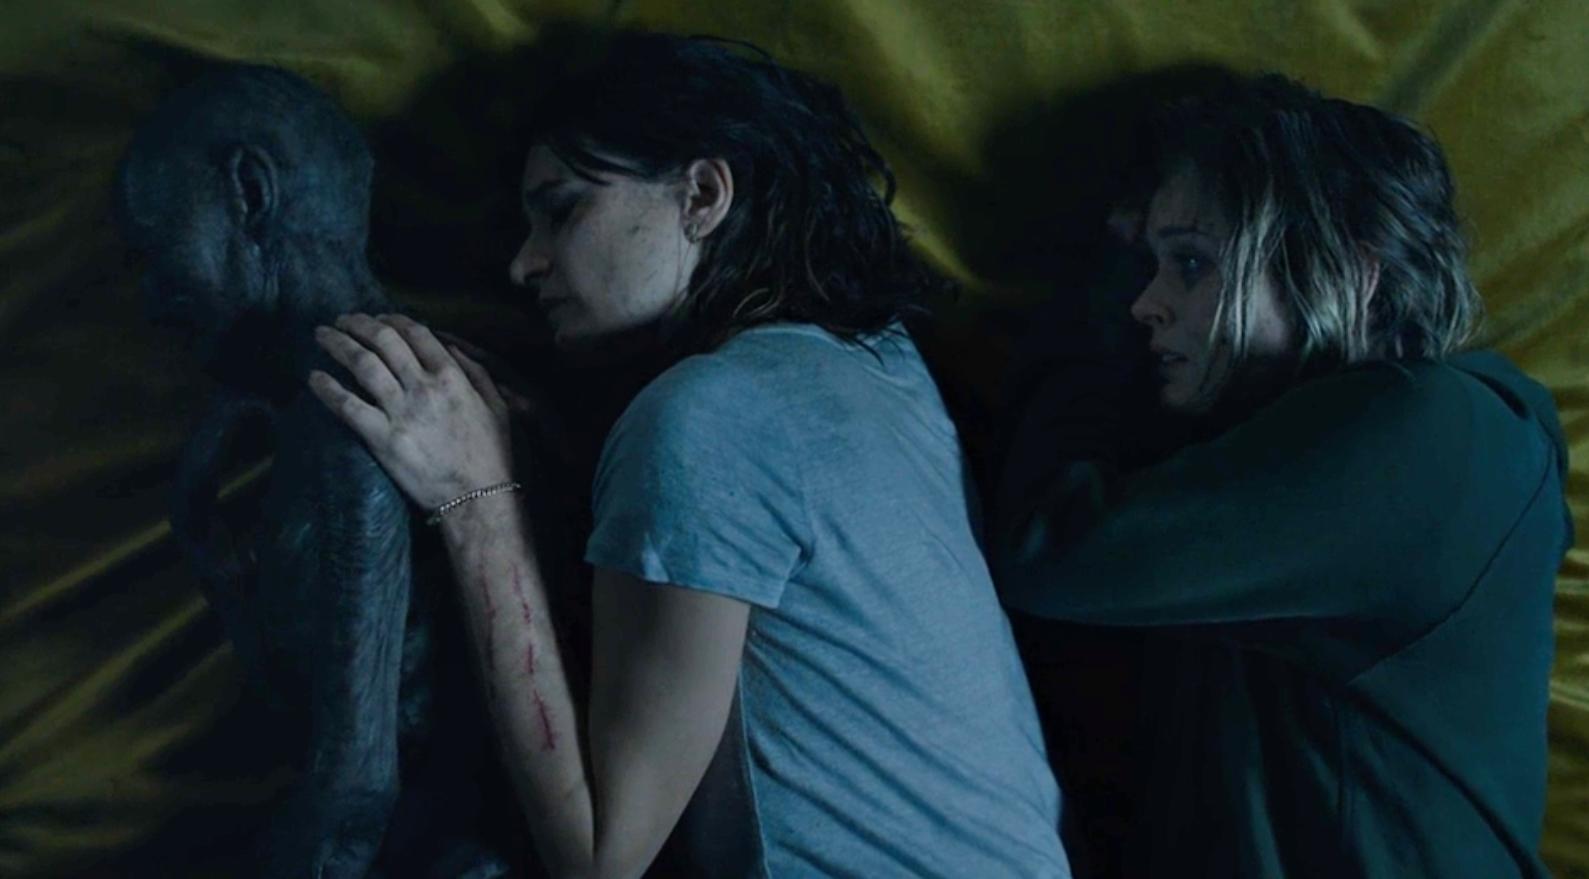 مشاهدة فيلم Relic (2020) مترجم HD اون لاين